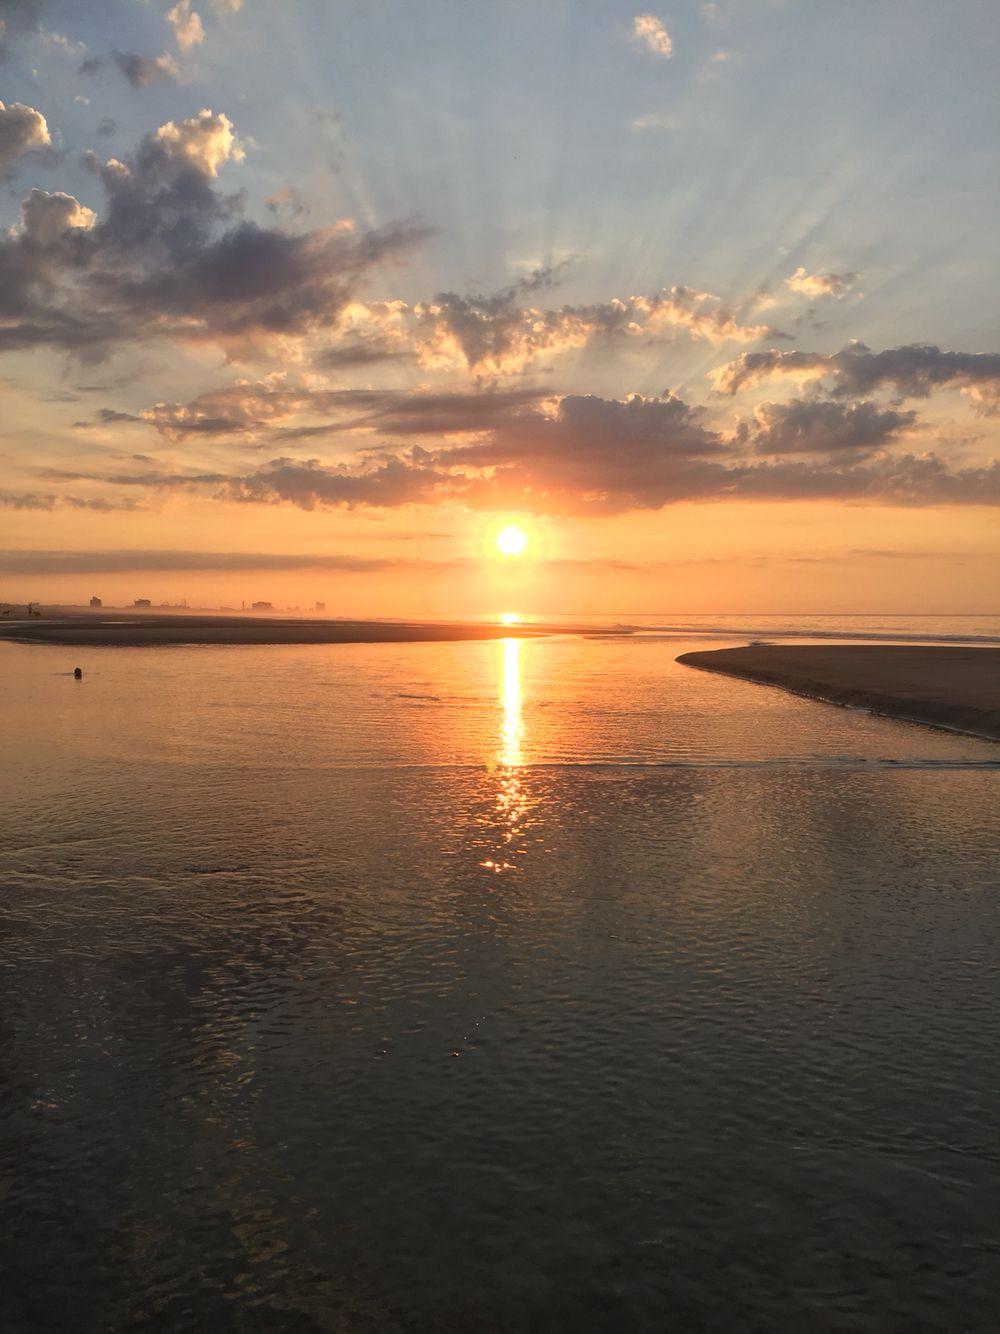 Ocean city nj sunrise my pix pinterest ocean city nj and ocean city nj sunrise nvjuhfo Image collections